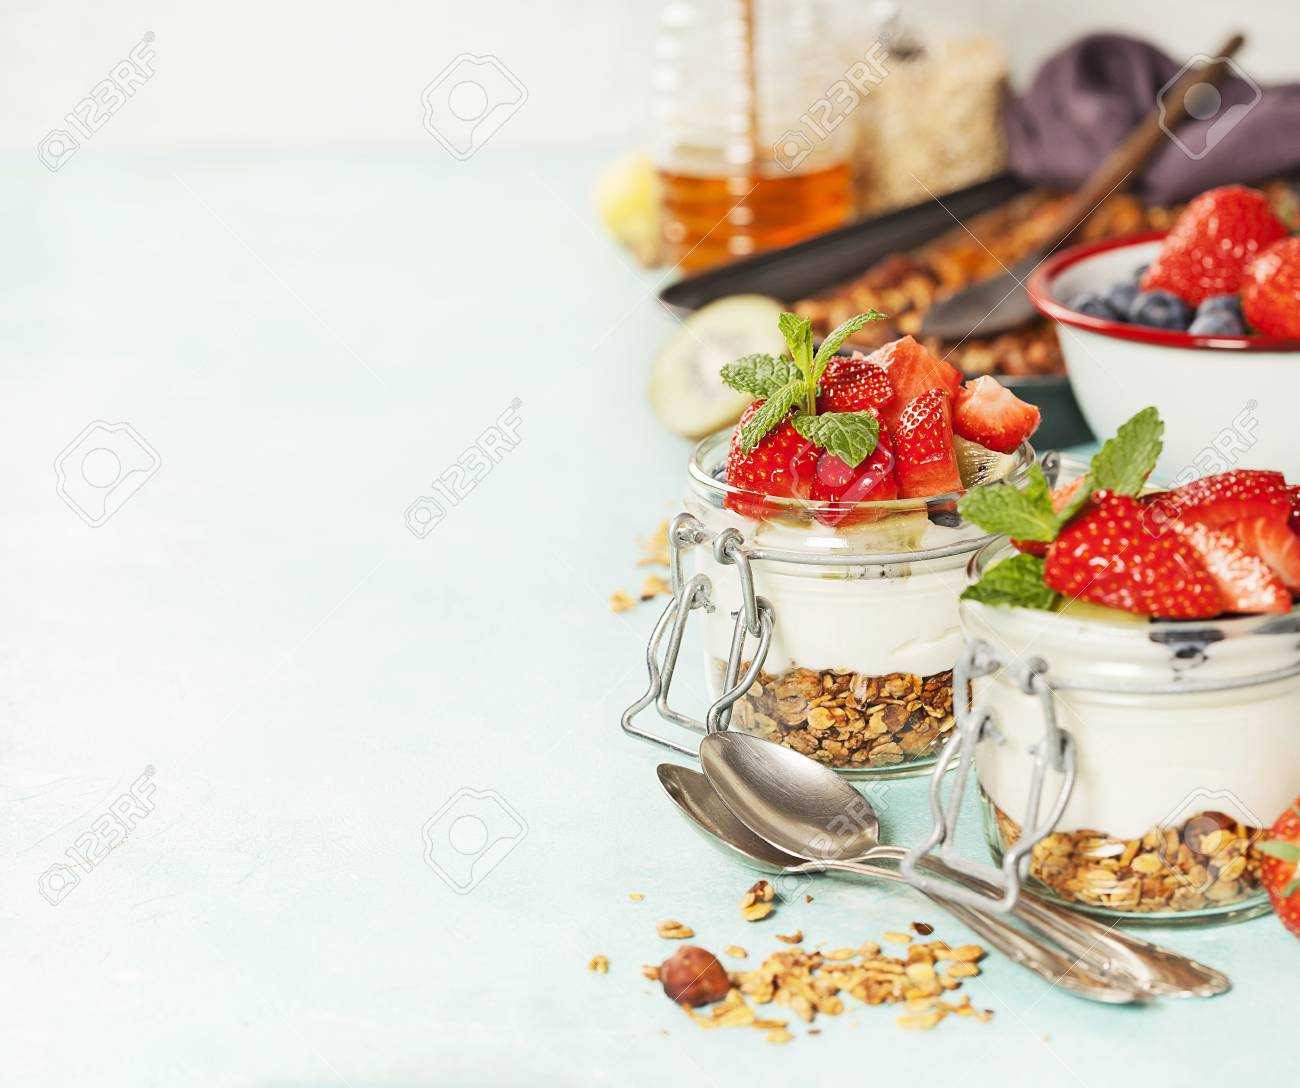 Homemade Granola Muesli With Nuts And Dried Fruits And Yogurt 1300x1088